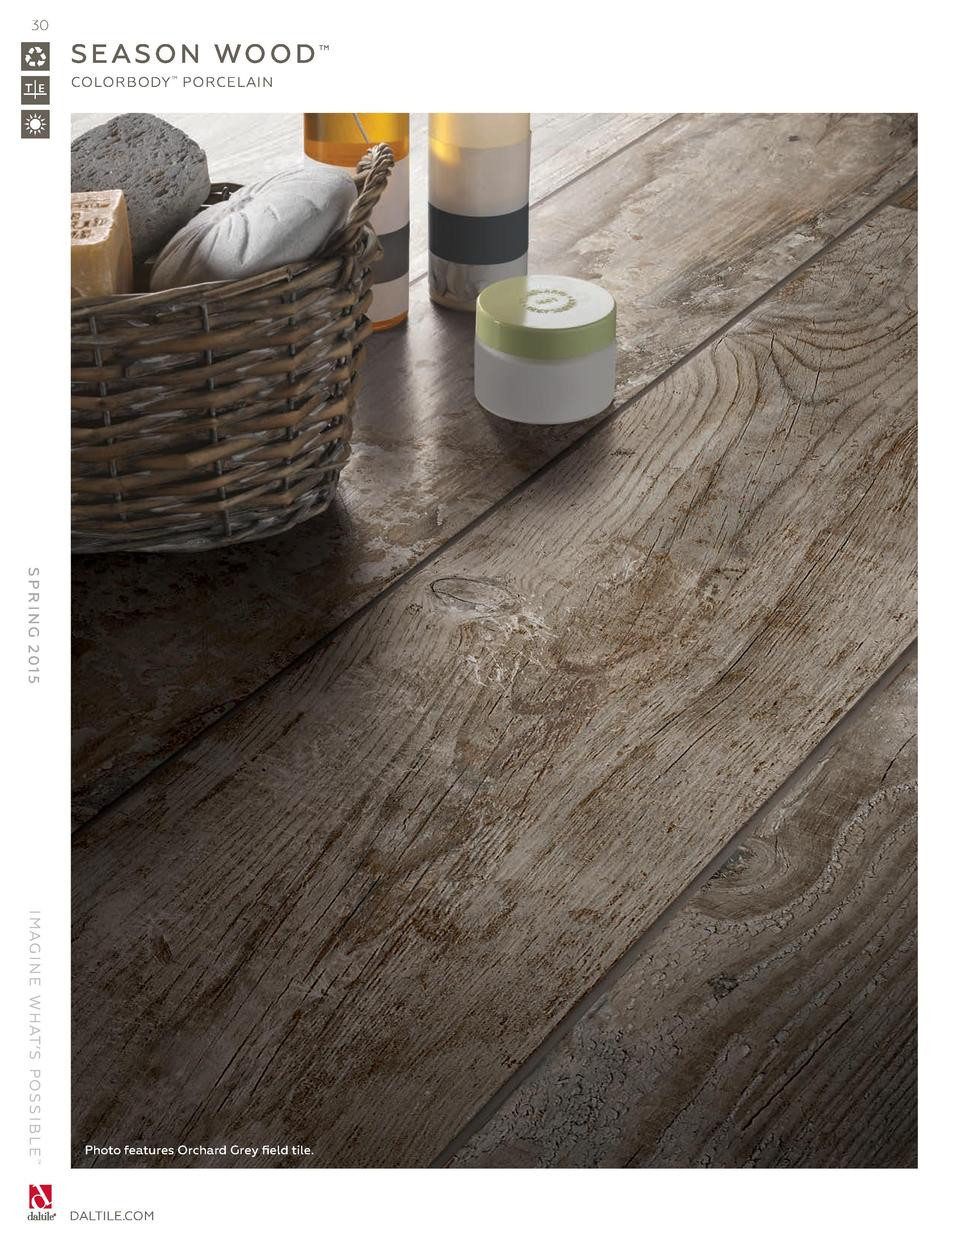 reclaimed hardwood flooring nashville of daltile spring 2015 catalog simplebooklet com regarding 30 s e a s o n wo o d colorbody porcelain s p r i n g 2 01 5 i mag i n e w hat s po